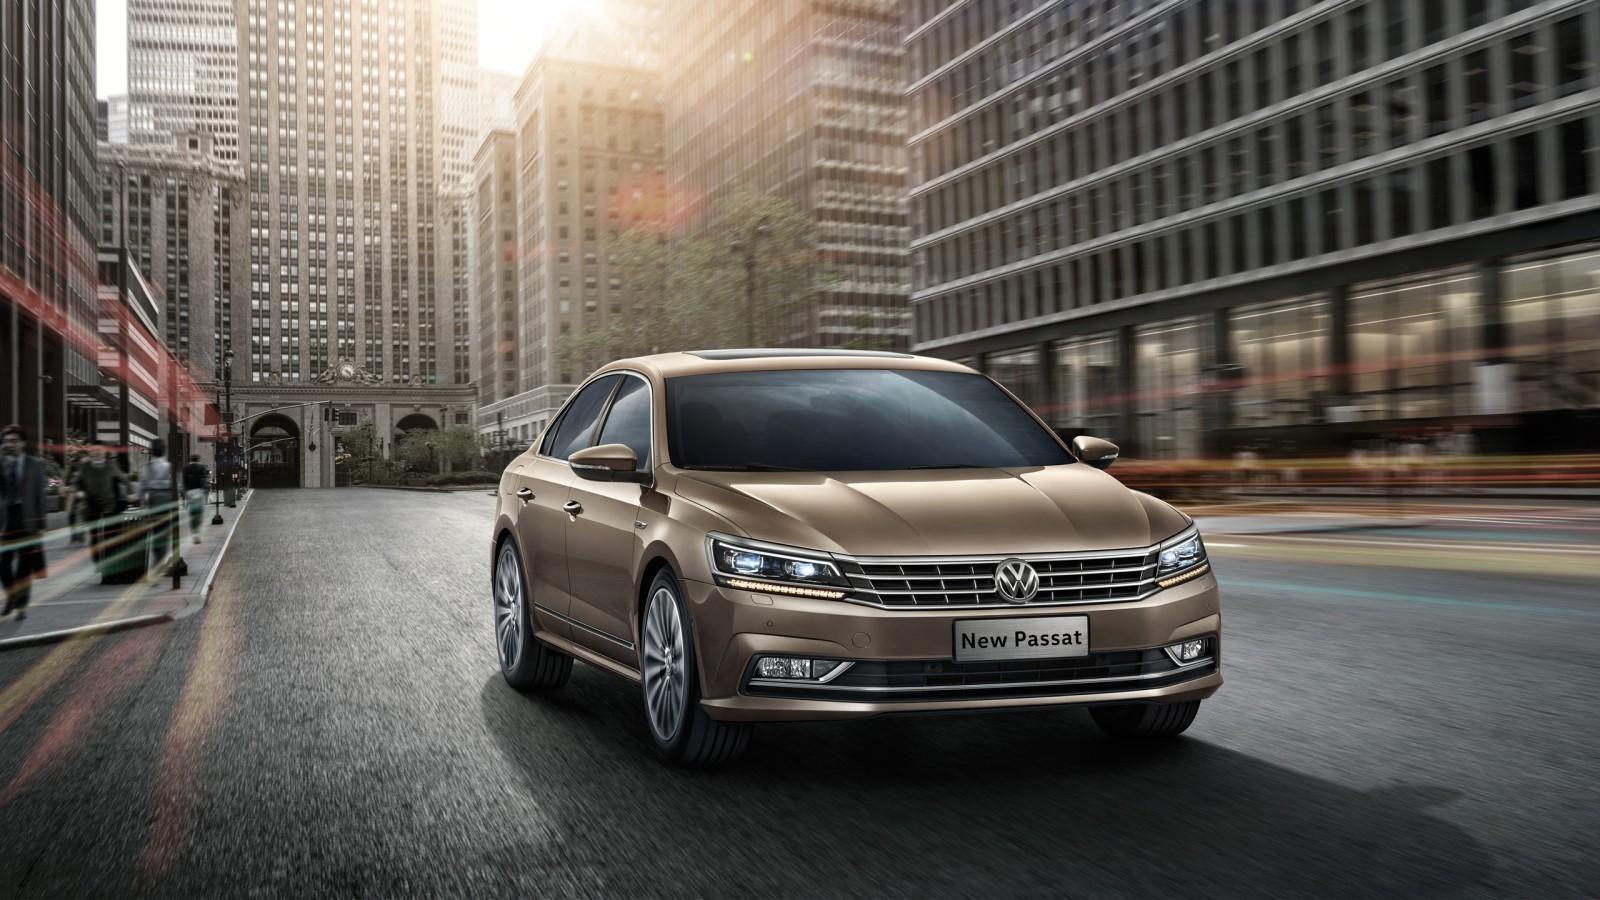 Cars Desktop Wallpapers Hd 4k Race Volkswagen Passat Cn Spec 2016 Wallpaper Hd Car